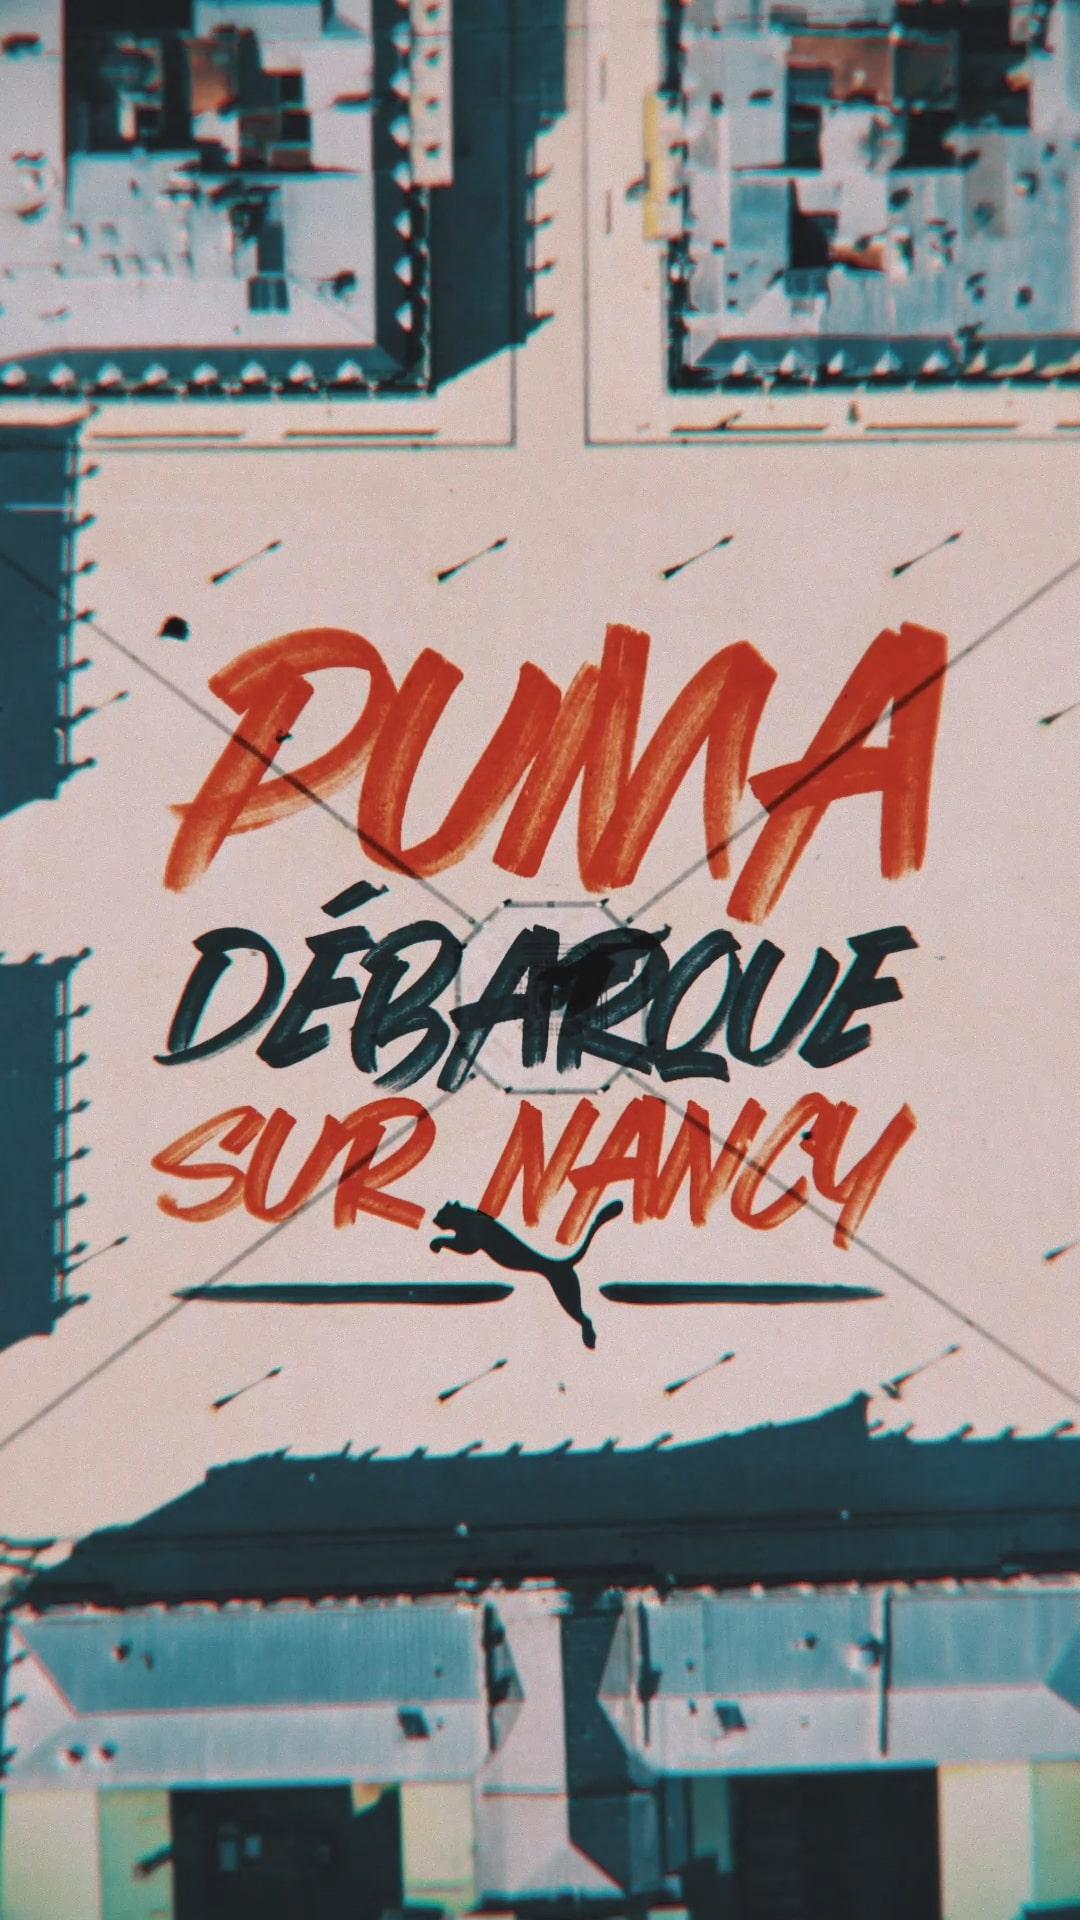 puma-equipementier-as-nancy-lorraine-1